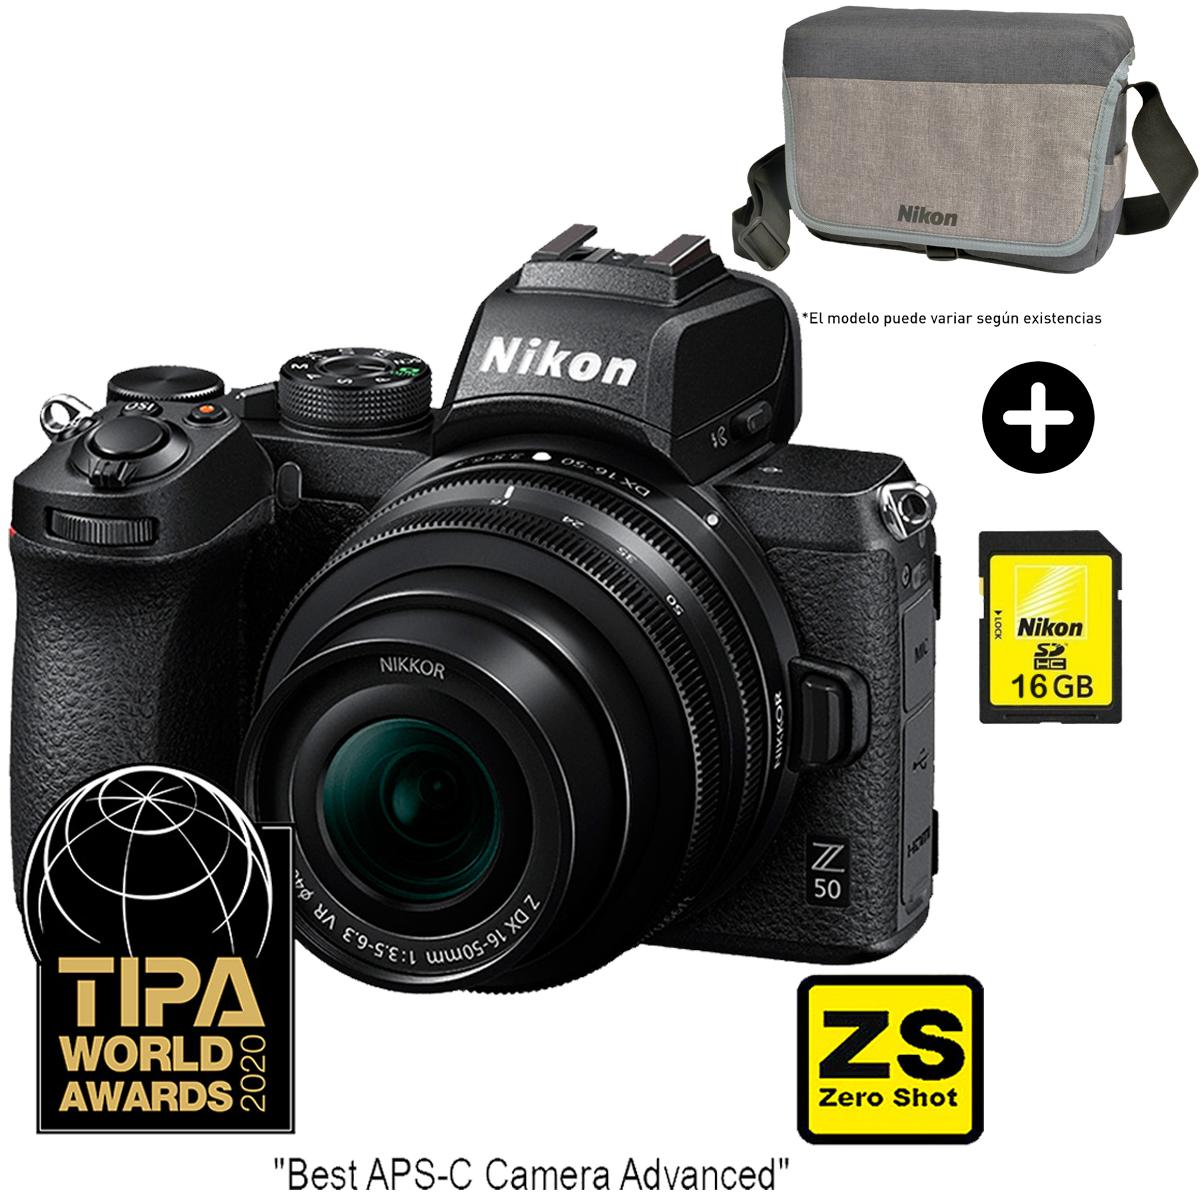 Câmera Nikon Z 50 + Objetiva NIKKOR Z 16-50 mm + Saco da câmera+cartão 16GB (Zero Shot)